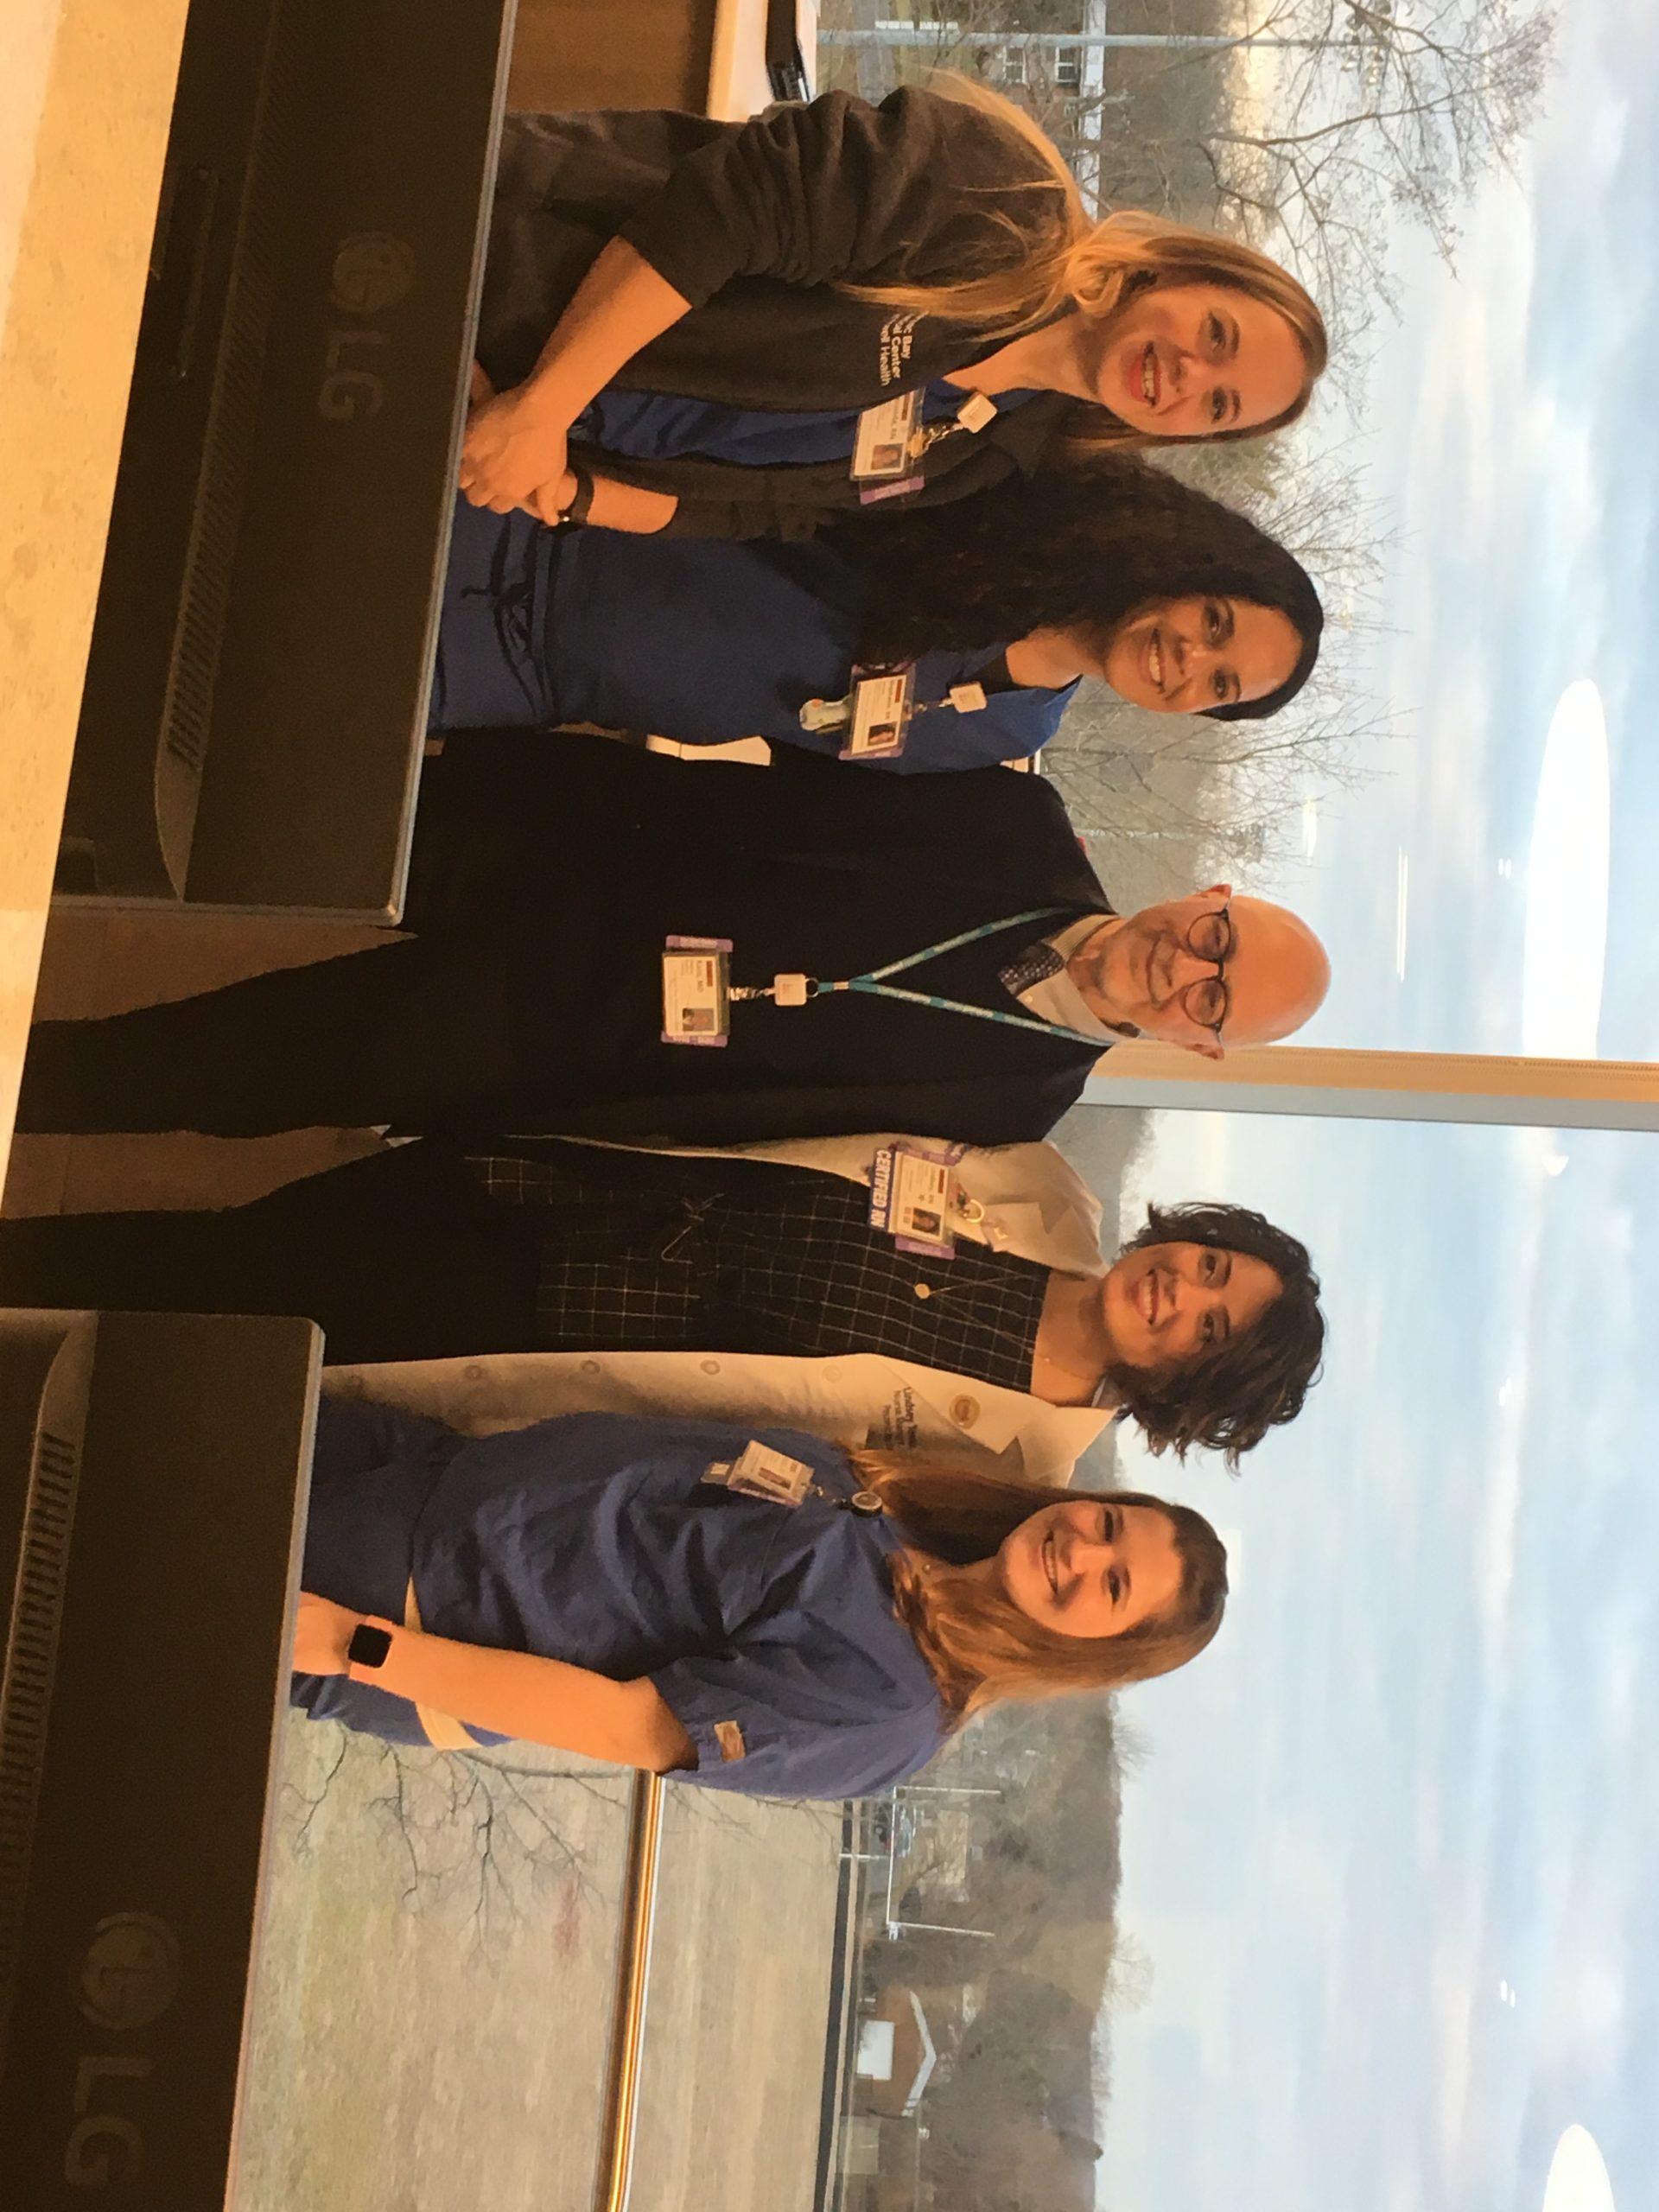 Dr. Stanley Katz, head of cardiology, with the RN team in the new heart center. Amanda DeArmitt, Stephia salcedo, Jessica McGuinness, and Lindsey Tereso. KITTYMERRILL